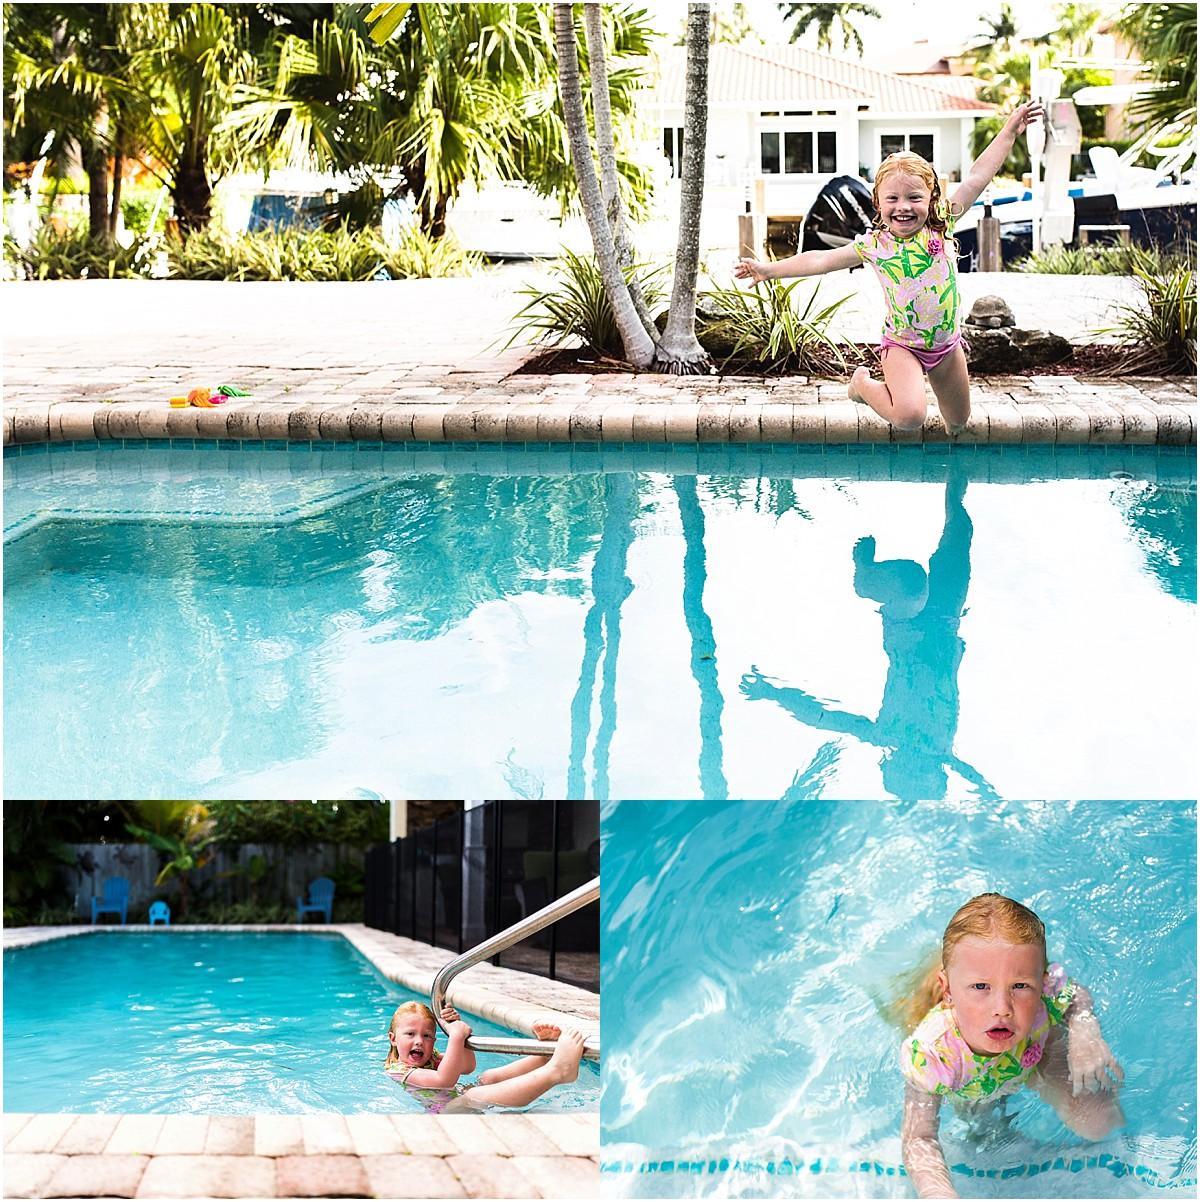 Ashley_Rogers_Photography_South_Florida_Photographer_Orlando_Photographer_Costa_Rica_Photographer_0795.jpg